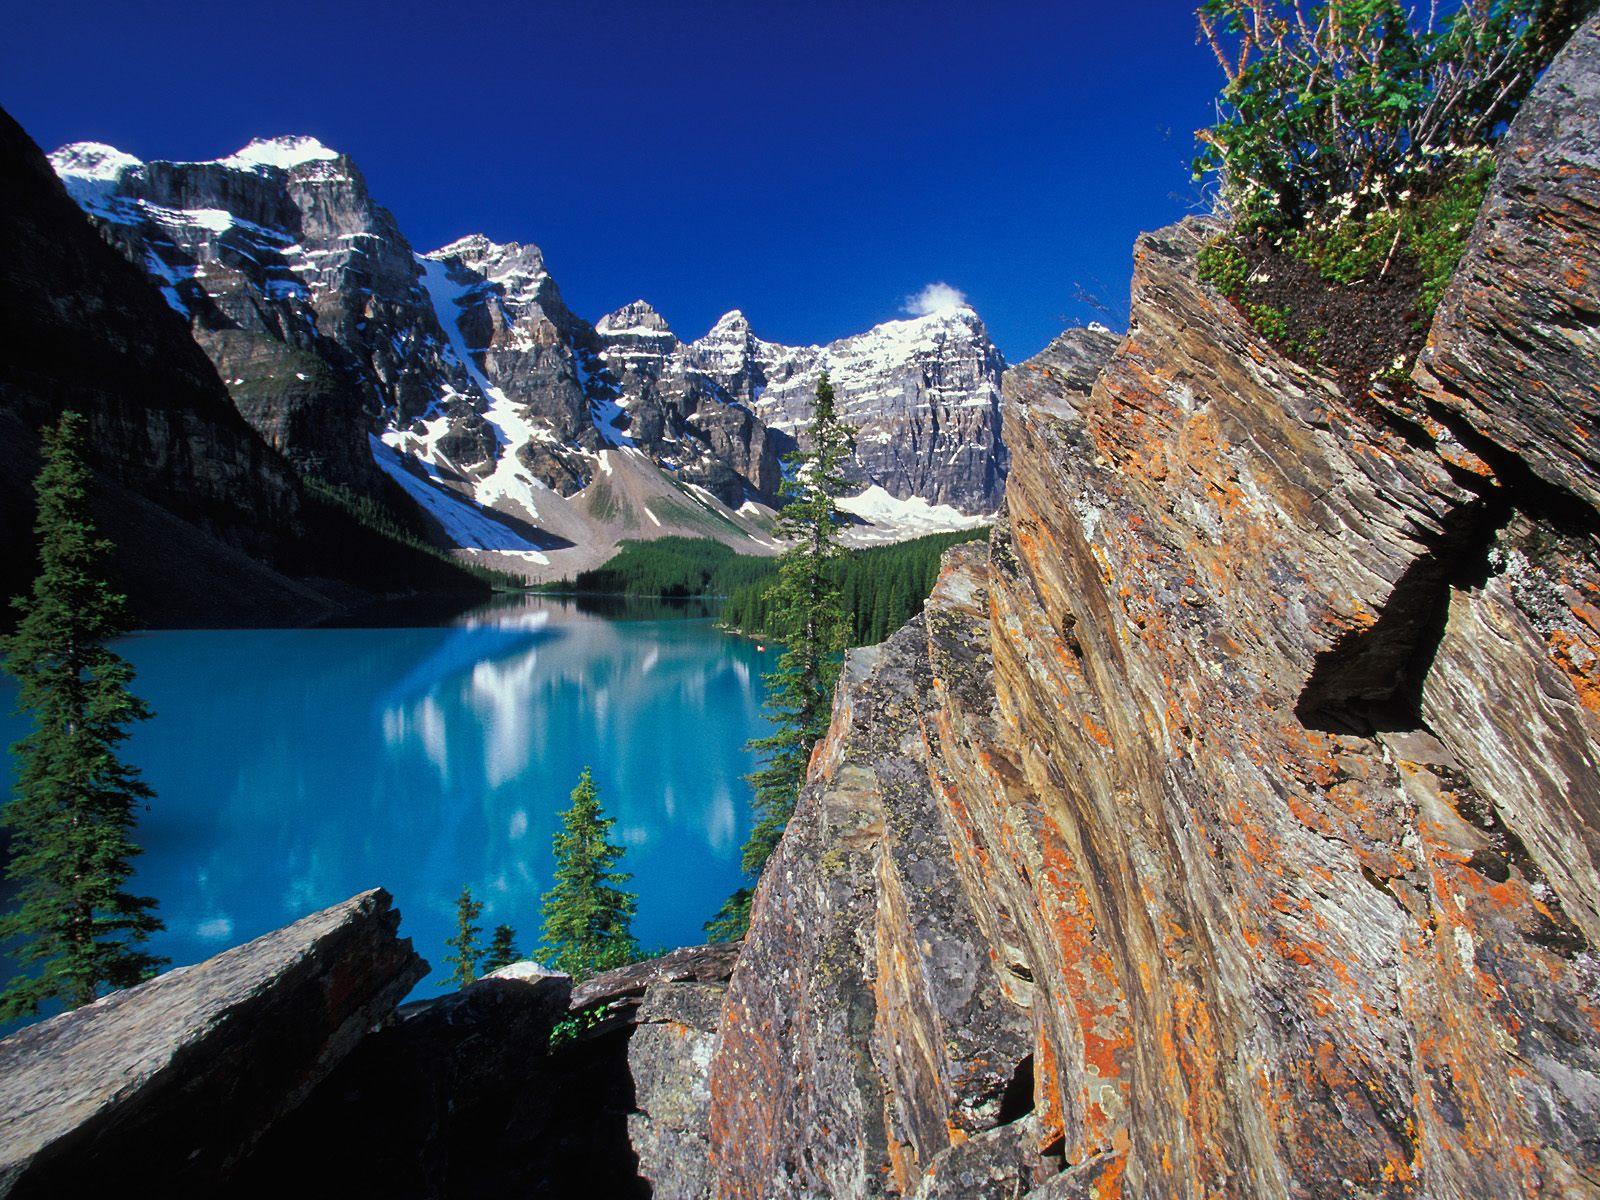 Ten Peaks Banff National Park Canada Wallpaper   HQ Wallpapers 1600x1200